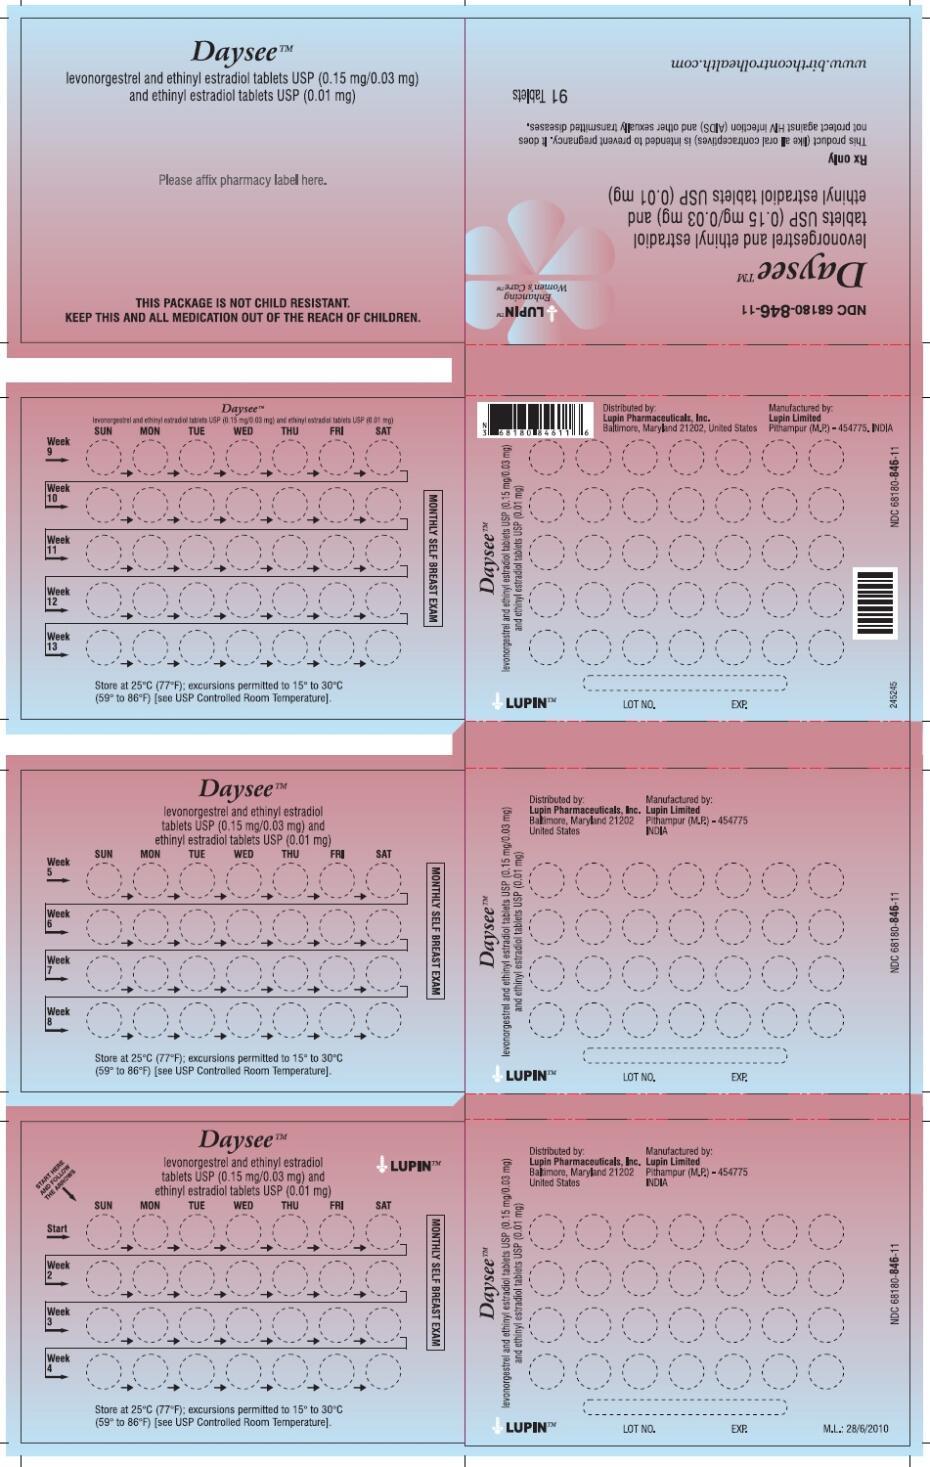 DAYSEE (levonorgestrel and ethinyl estradiol kit): Side